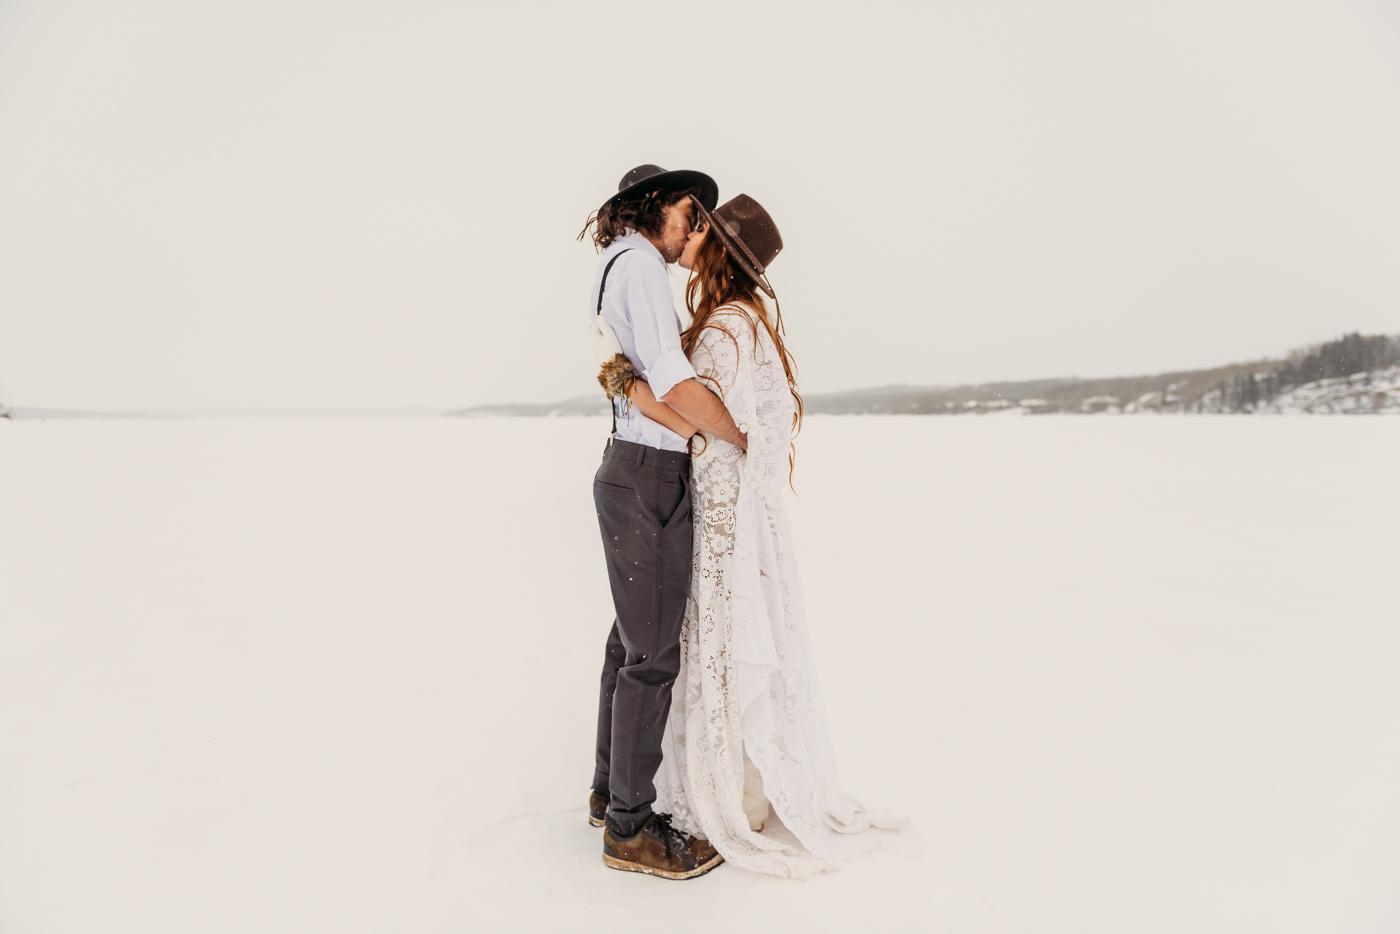 FortSt.John_photographer_TyraEPhotography_Wedding_Couple_Family_Photograhy_DawsonCreek_Elopement_Bride_Boduoir_Portraits-5.jpg